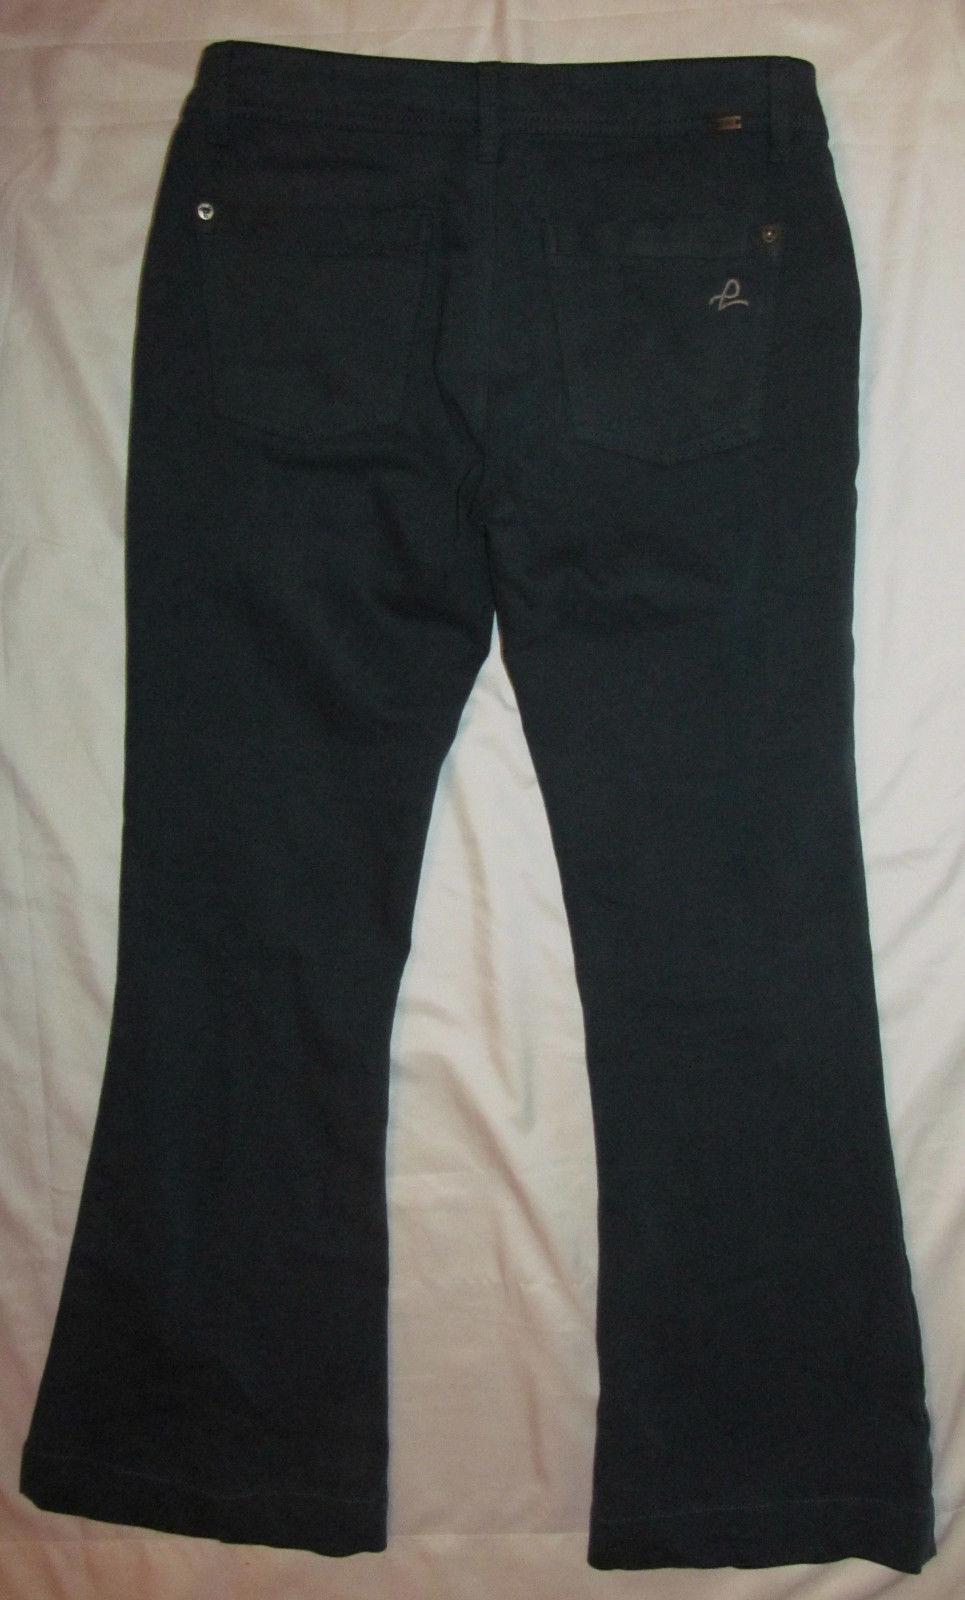 DL 1961 JOY HIGH RISE JADE FLARE SUNDAY BRUNCH JEGGINGS SNOB dusty teal jeans